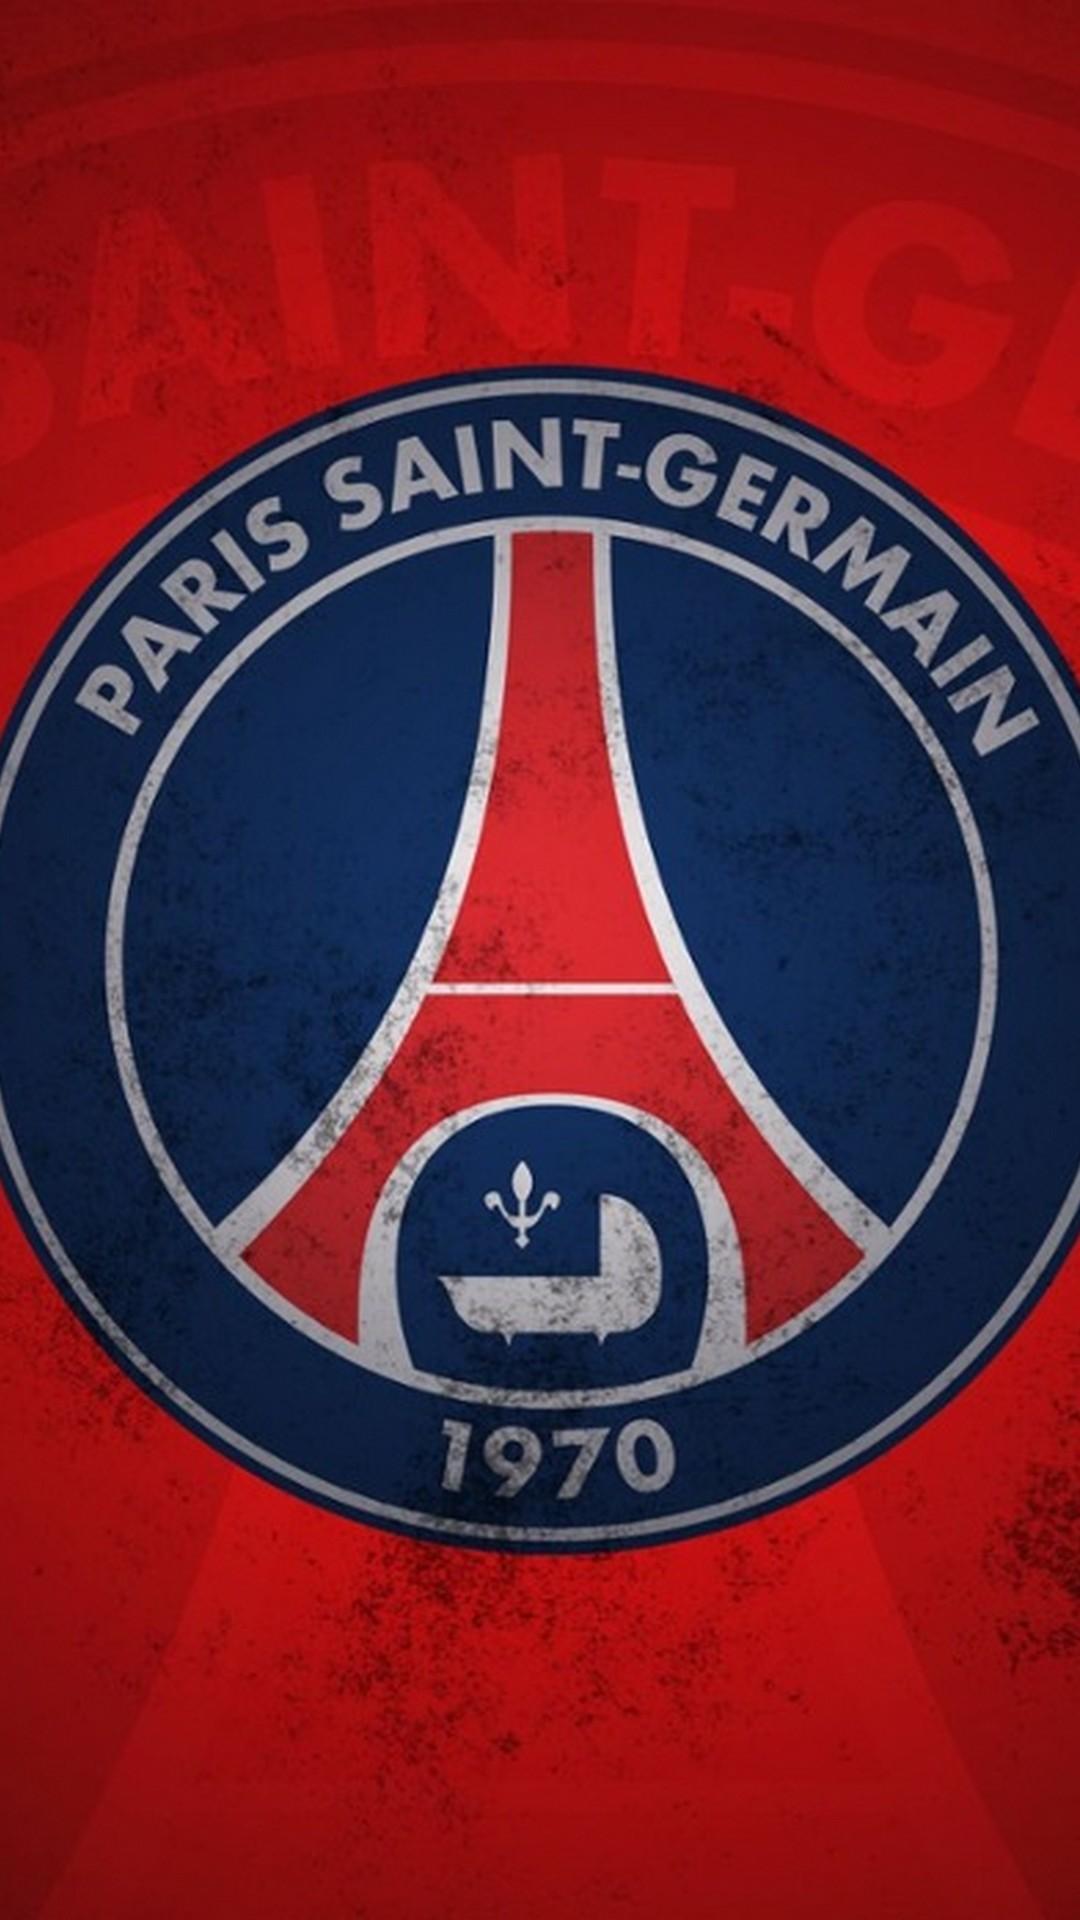 psg wallpaper iphone hd 2021 football